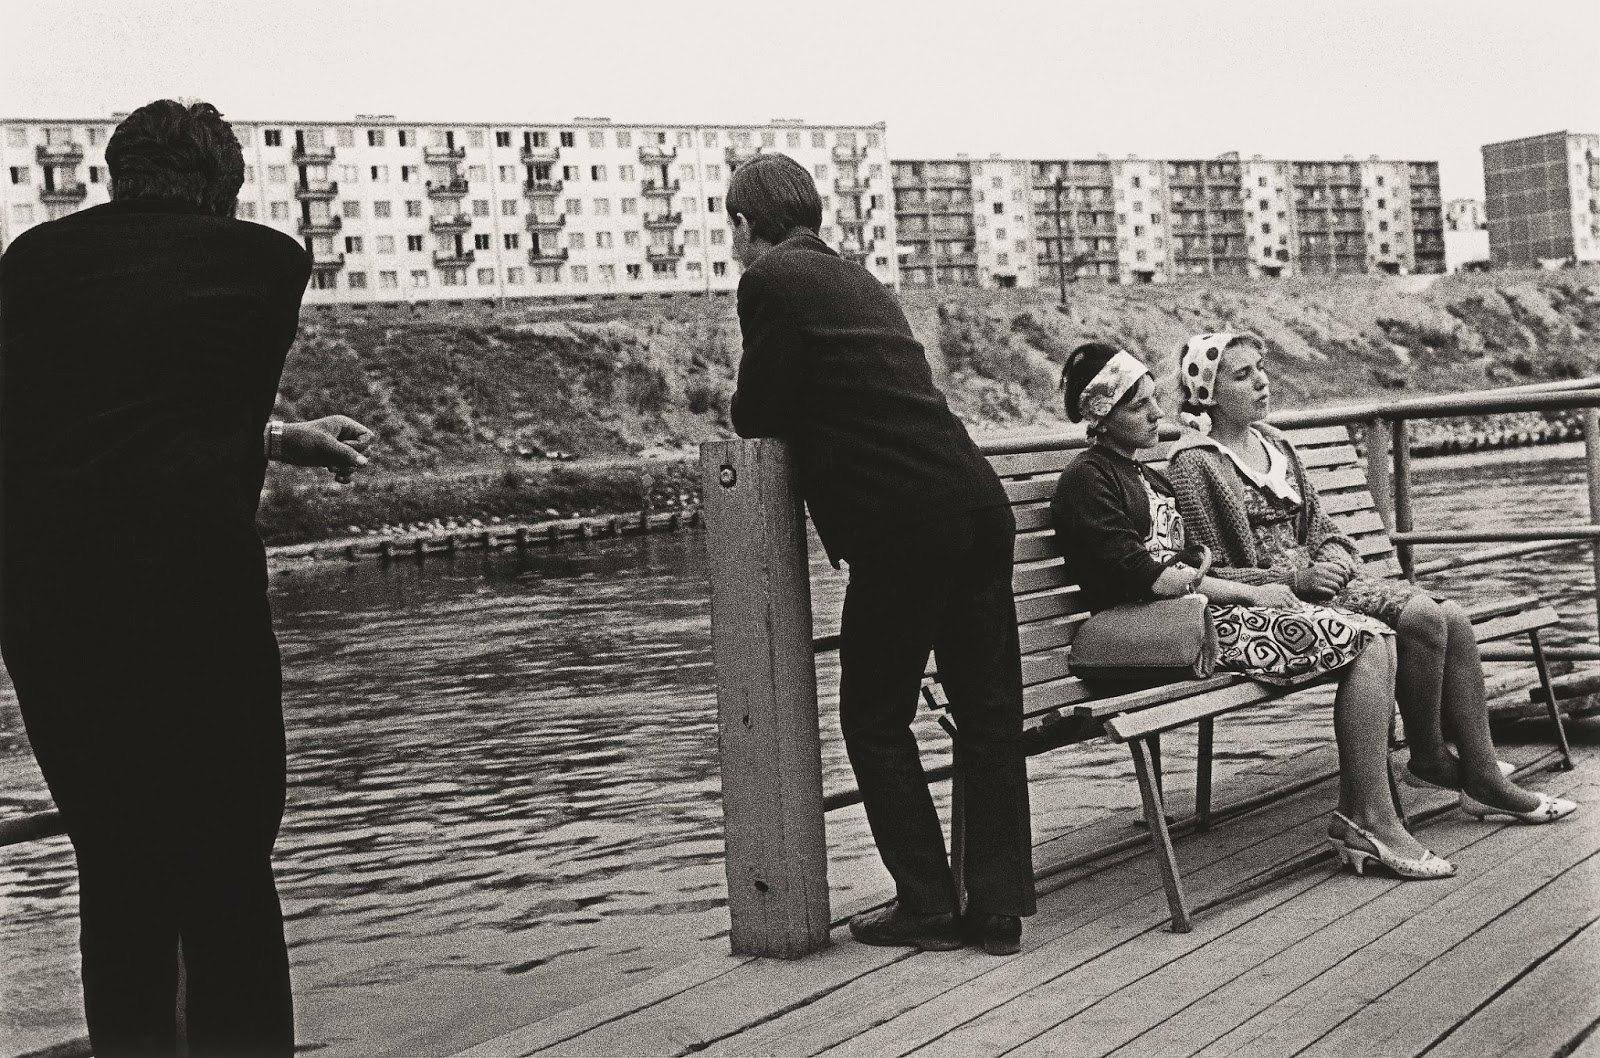 1964. Паром Жирмунай-Антакальнис